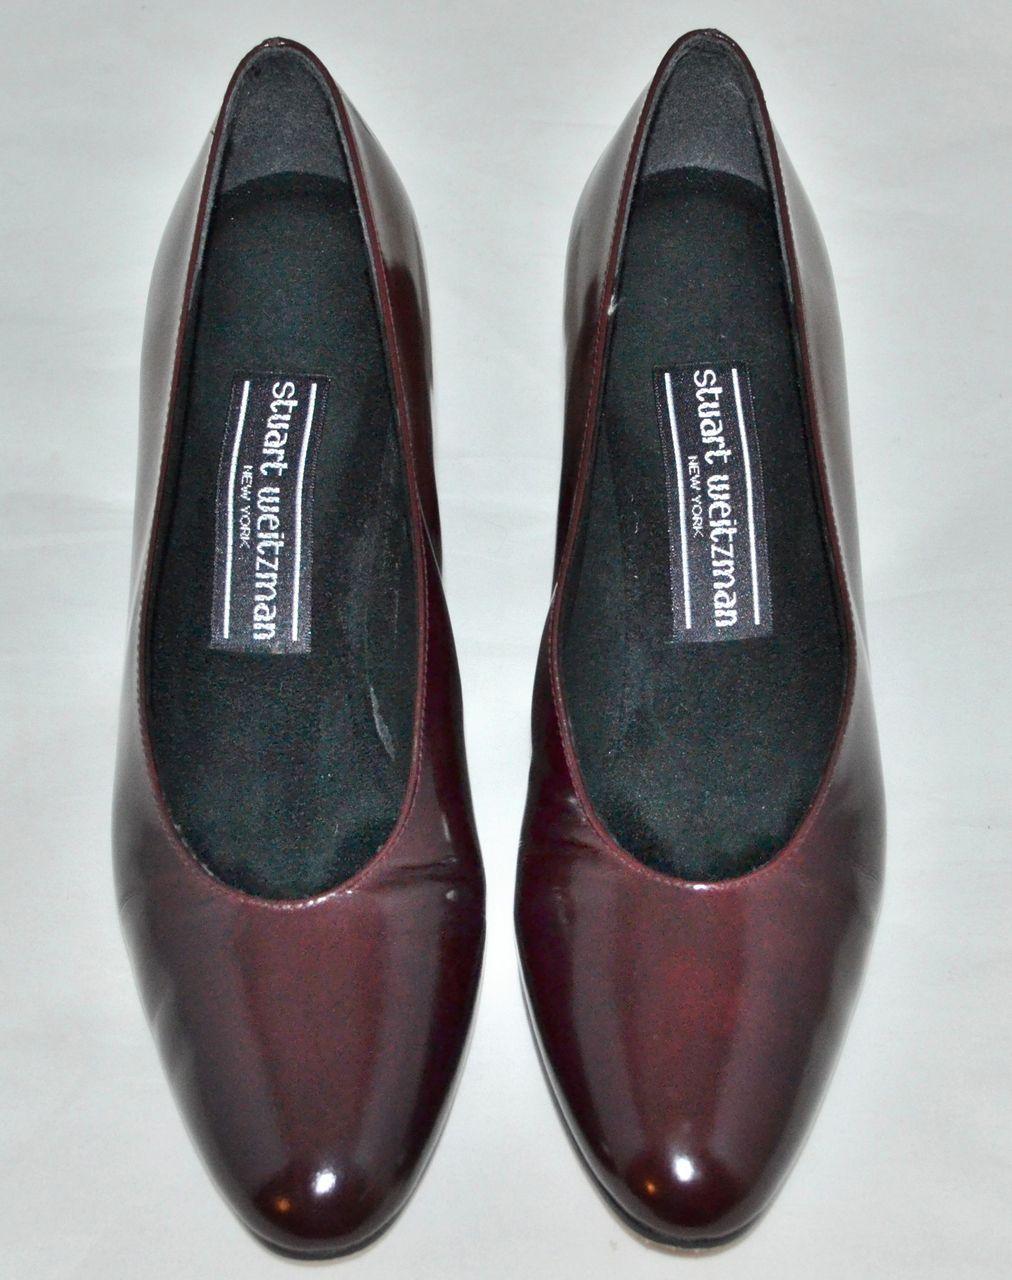 Stuart Weitzman ~ Rust Brown Leather Pumps/Heels ~ Size 6 from ...